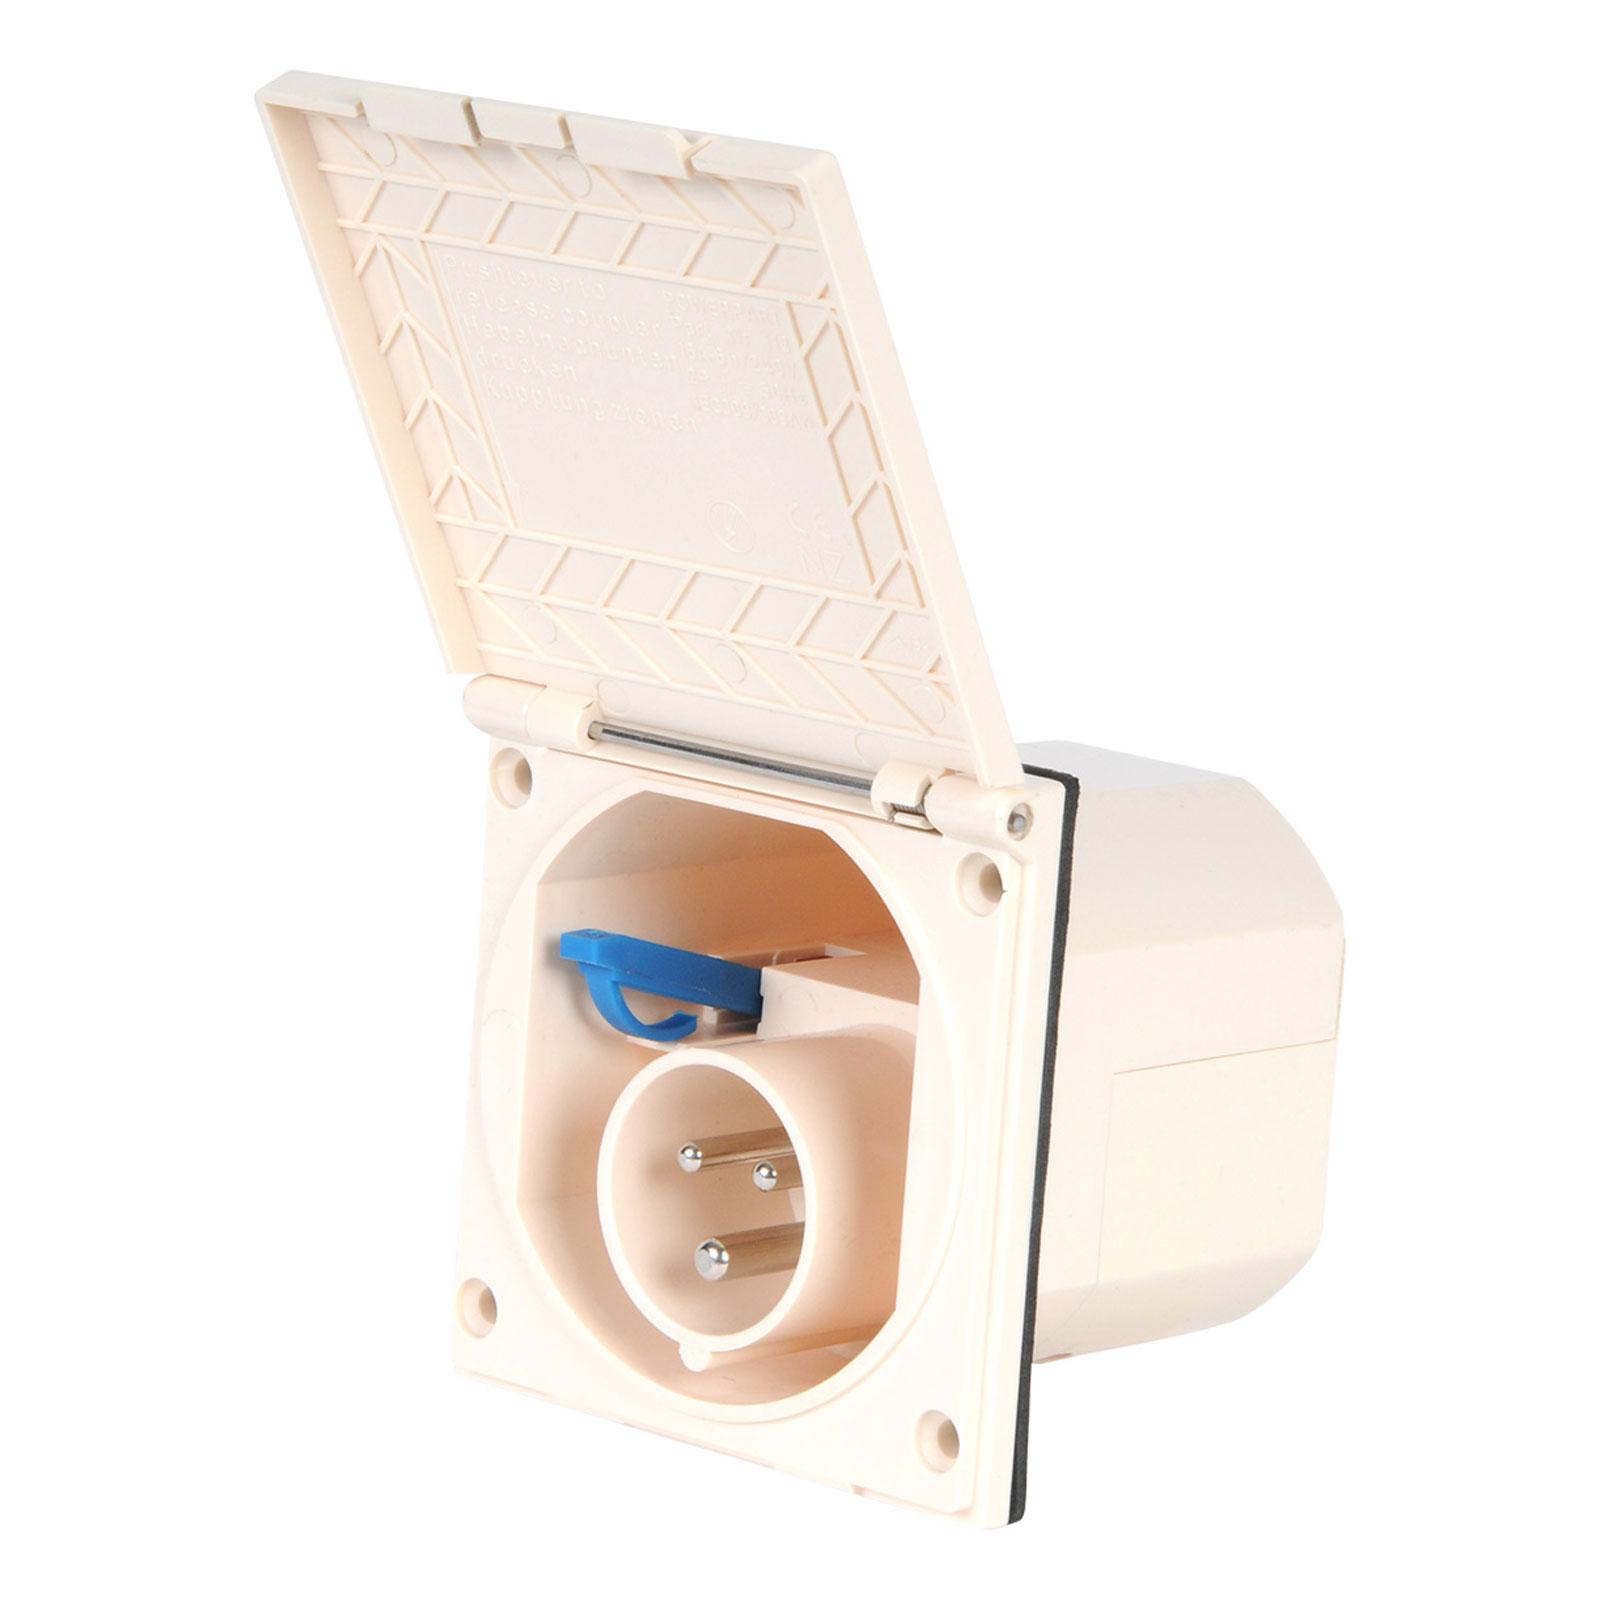 CEE Aussensteckdose Spritzwasser geschützt 200-240V 16A  IP44 beige